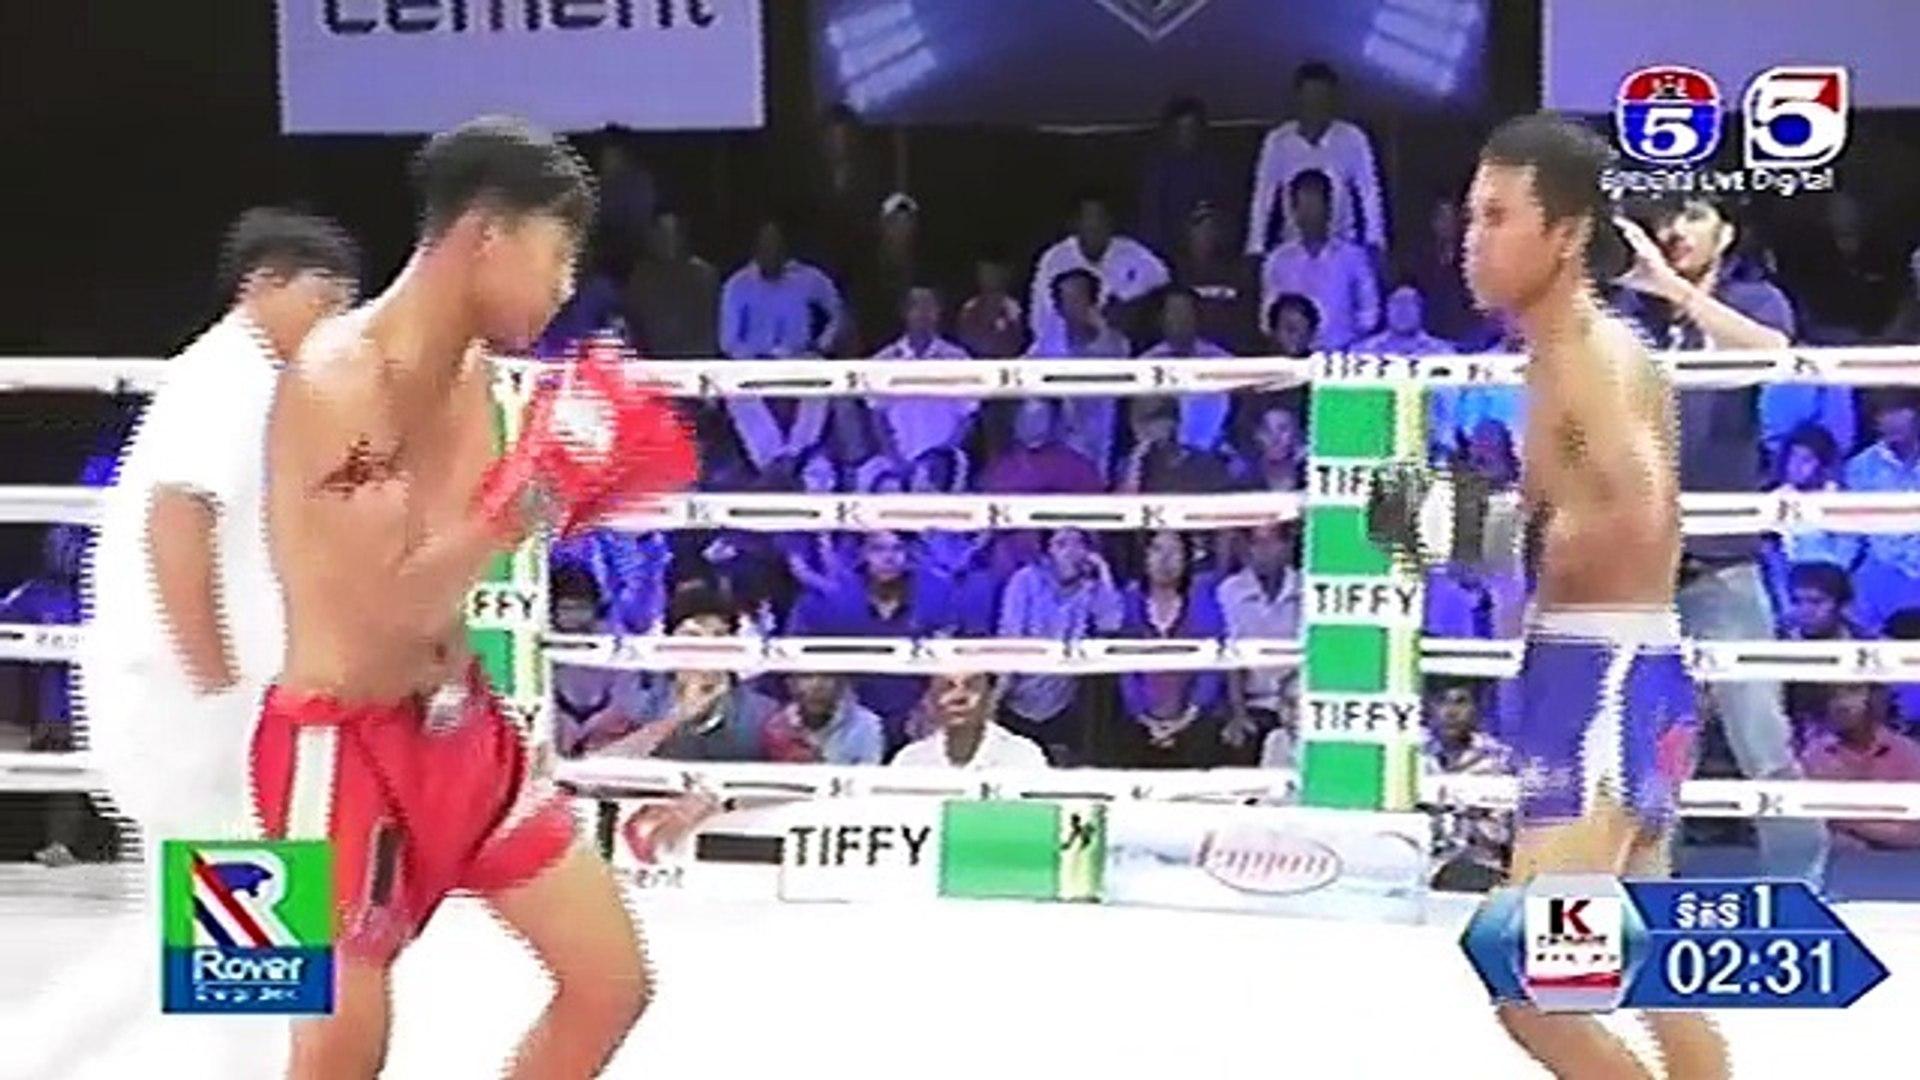 Meun Mekhea, Cambodia vs Cambodia, Koy Chantau, 21 July 2018, International Boxing, Khmer Boxing